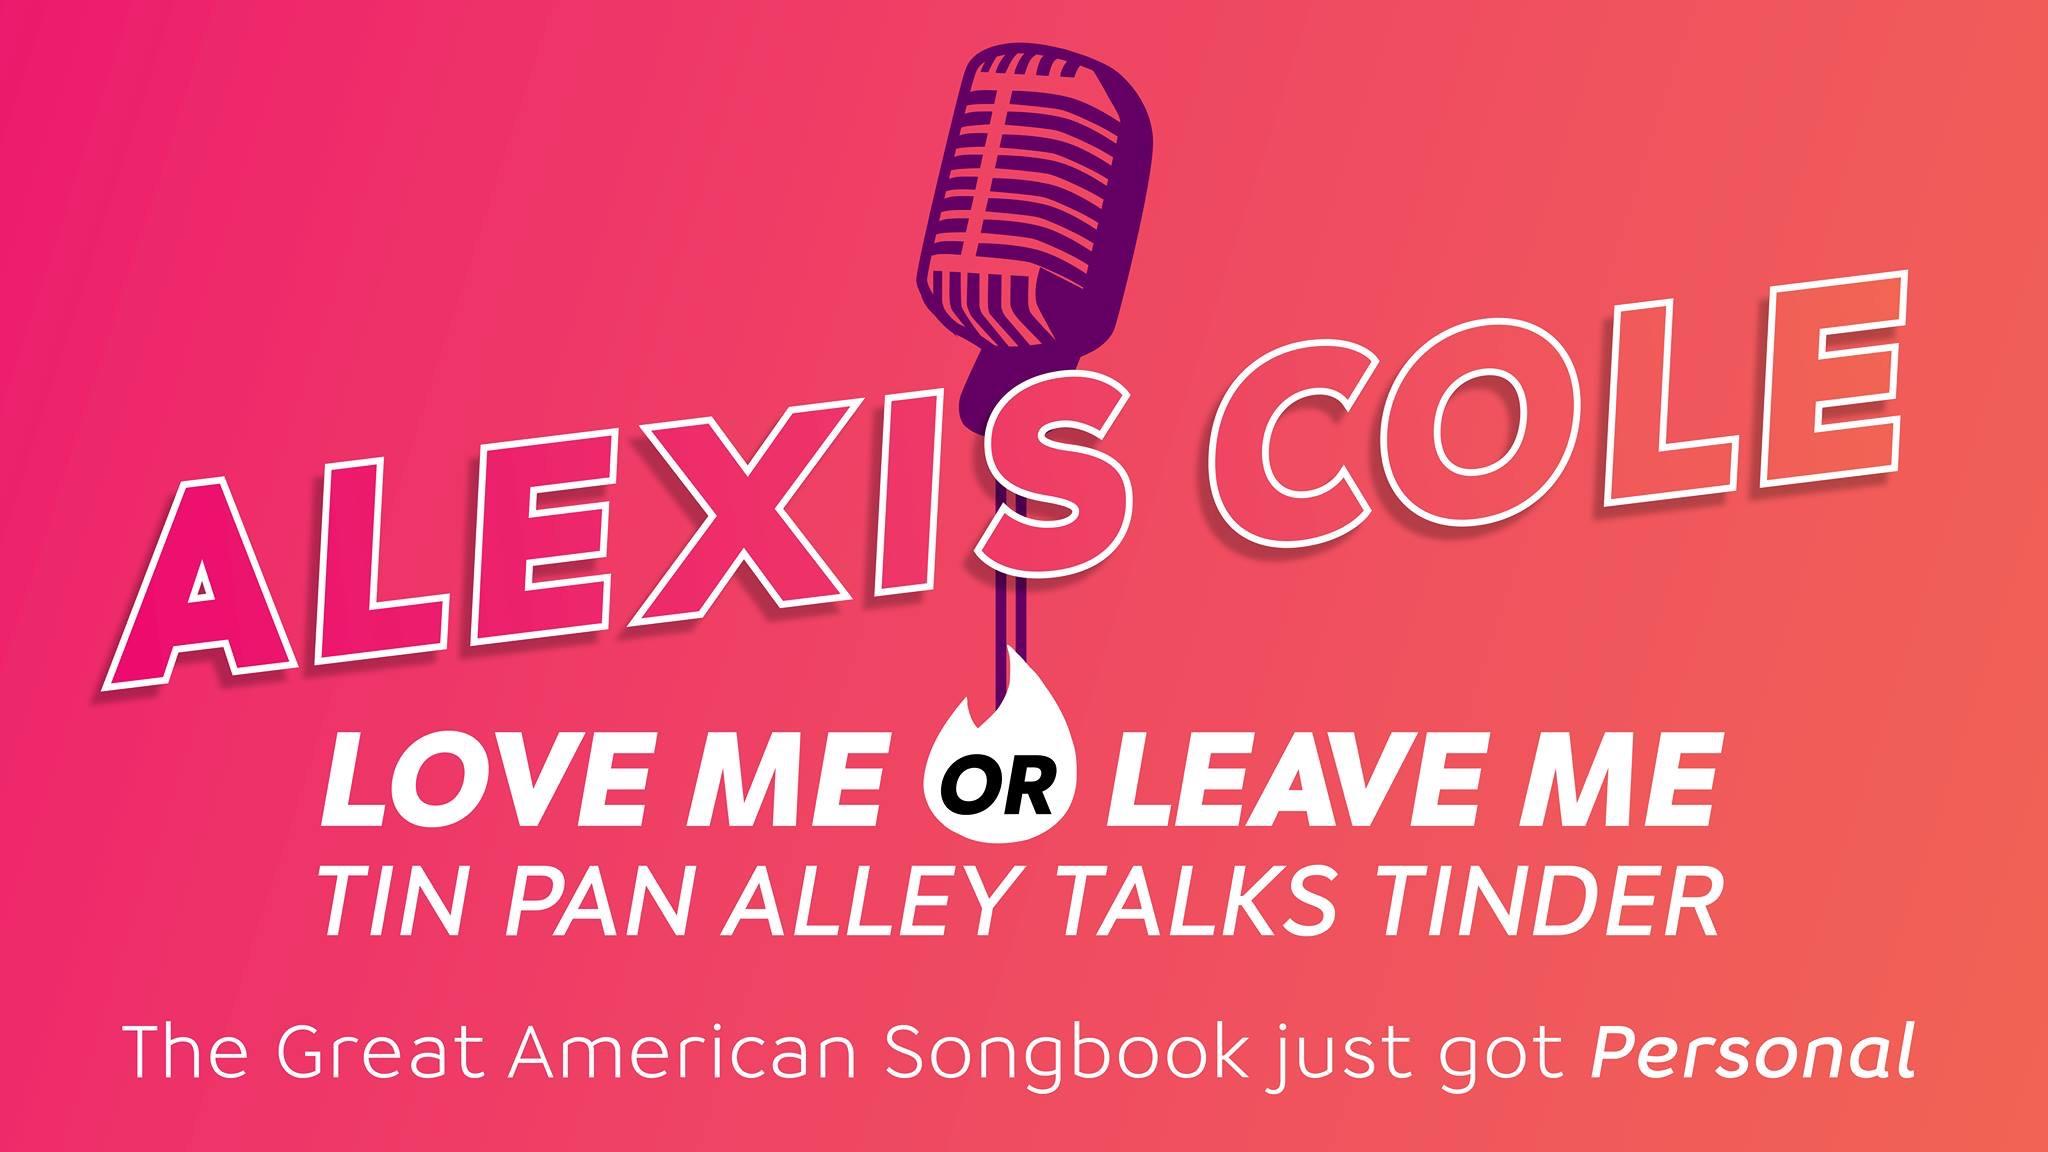 Alexis Cole_Love Me or Leave Me.JPG